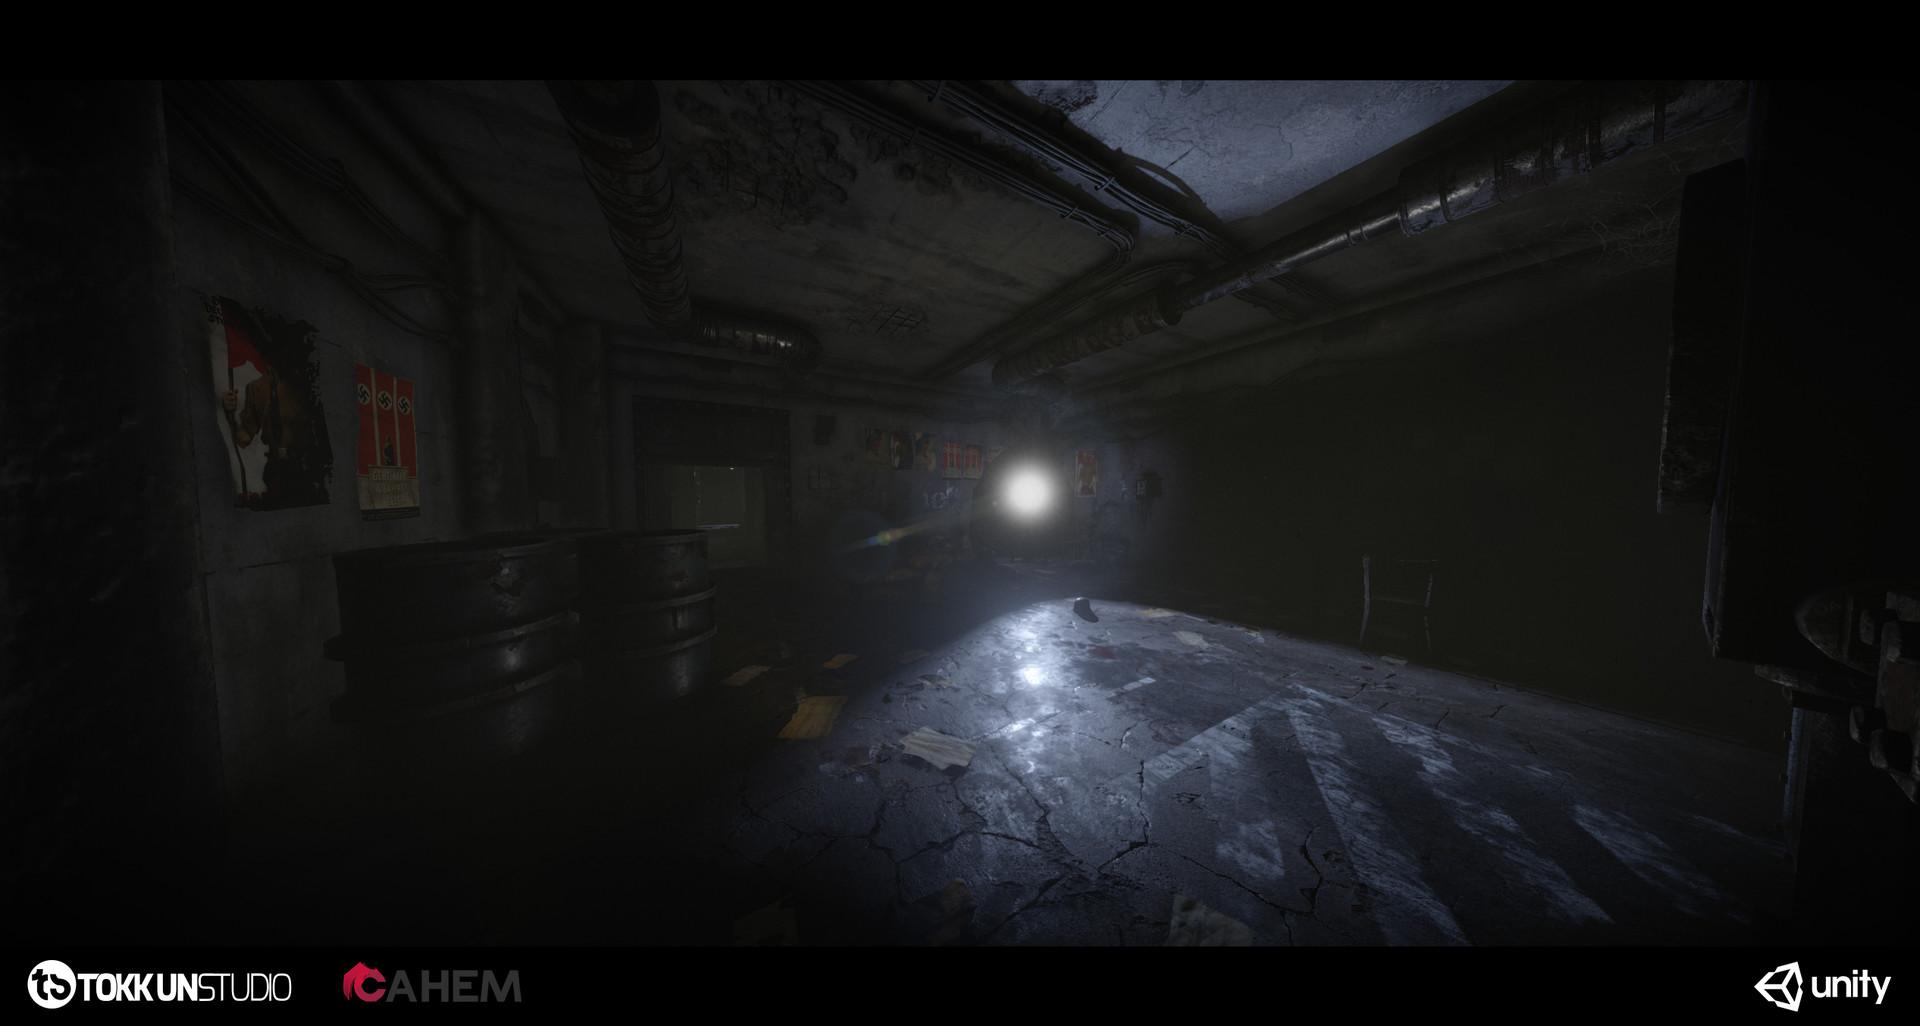 Tokkun studio bunker shot 32